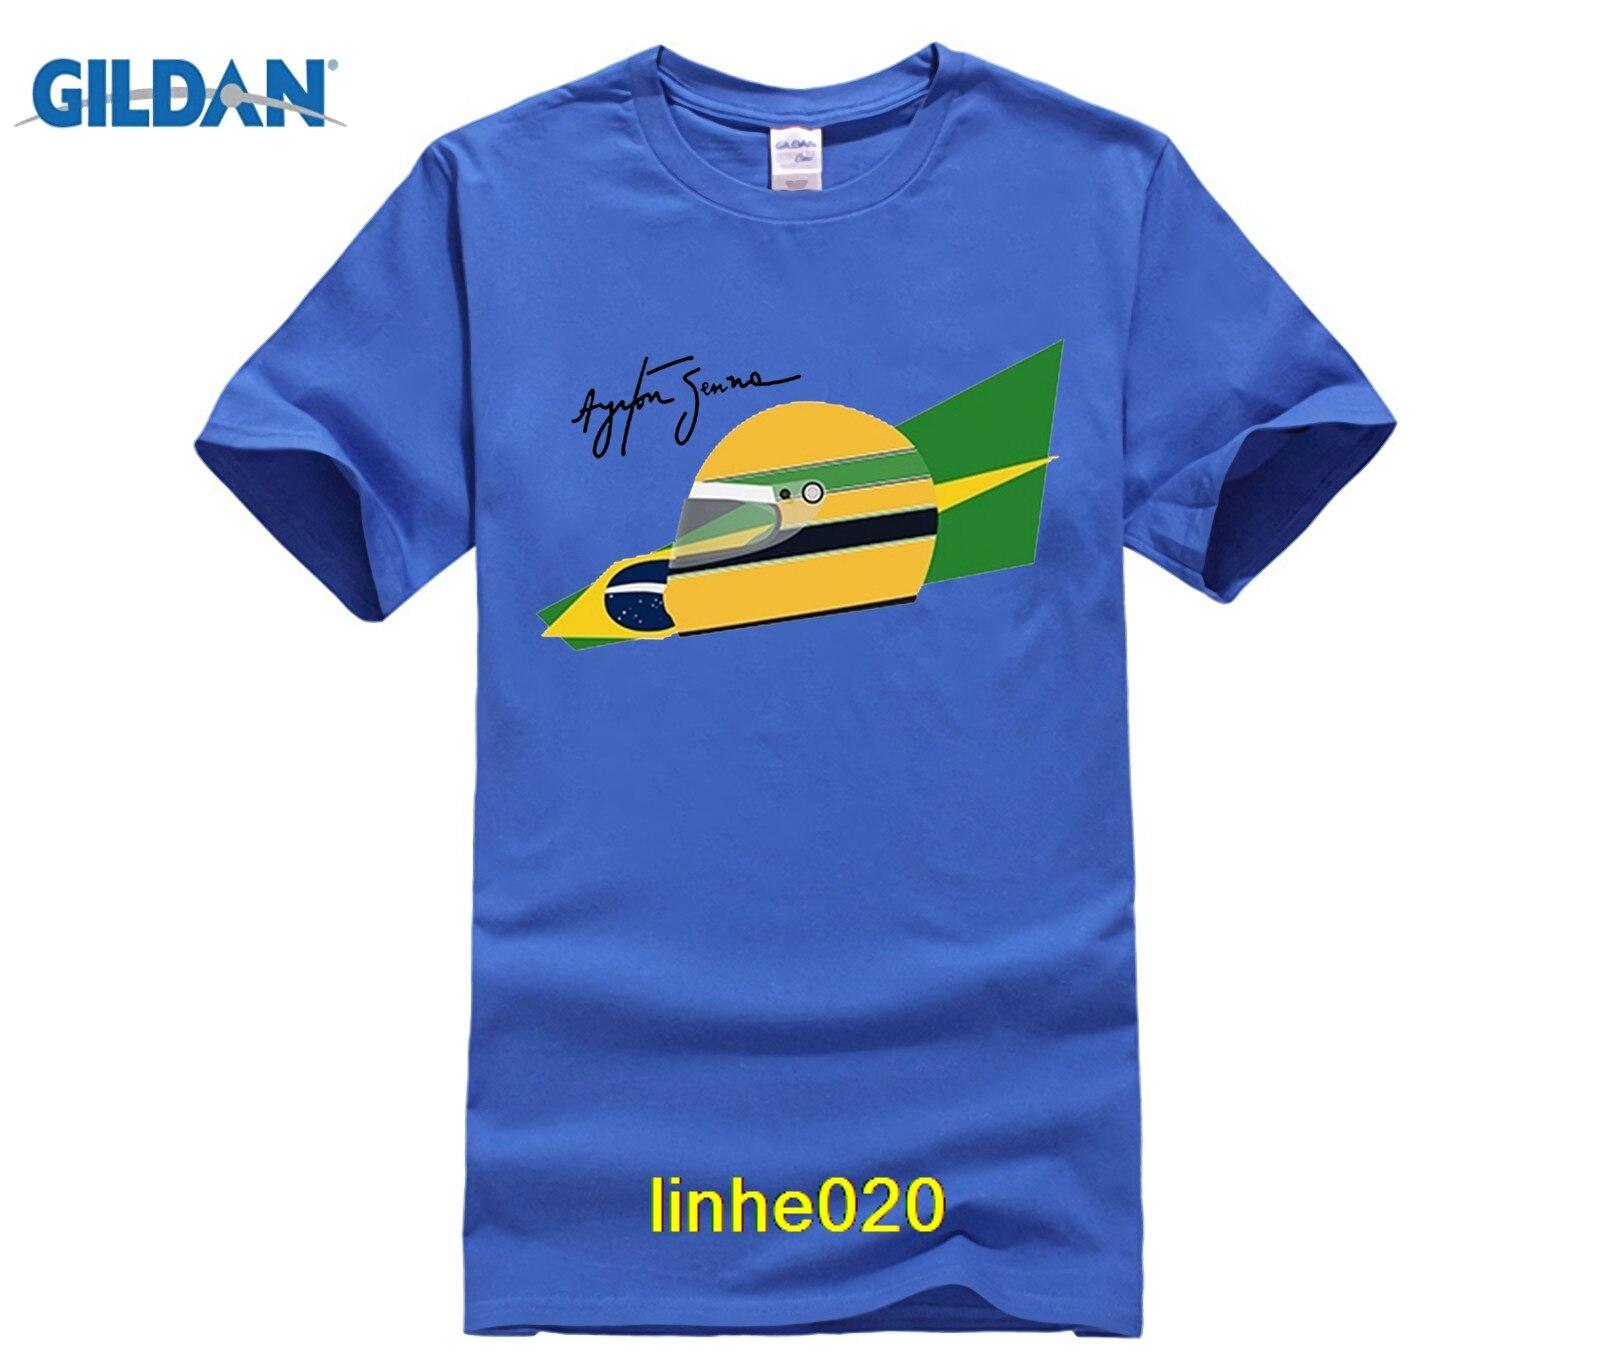 gildan-tee-ayrton-font-b-senna-b-font-brazil-helmet-1-signature-man-t-shirt-round-neck-short-sleeve-t-shirts-custom-made-male-men-clothing